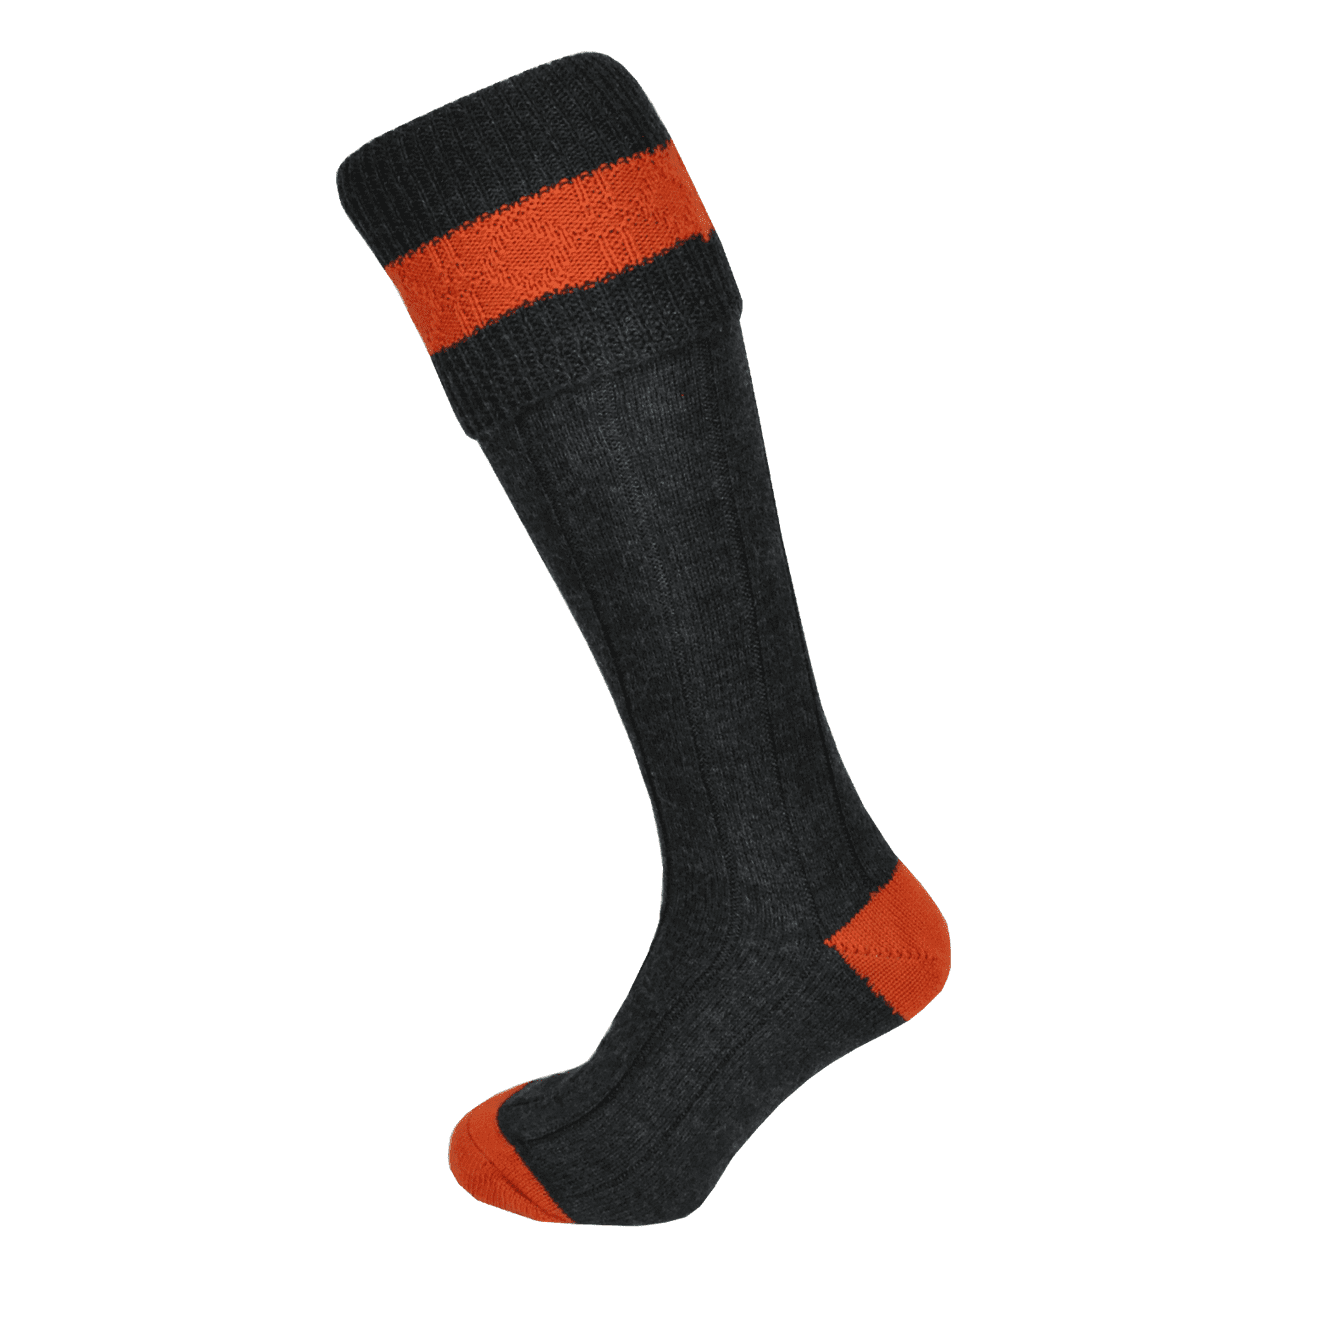 Macfarlaine Contrast Shooting Socks Charcoal/Orange